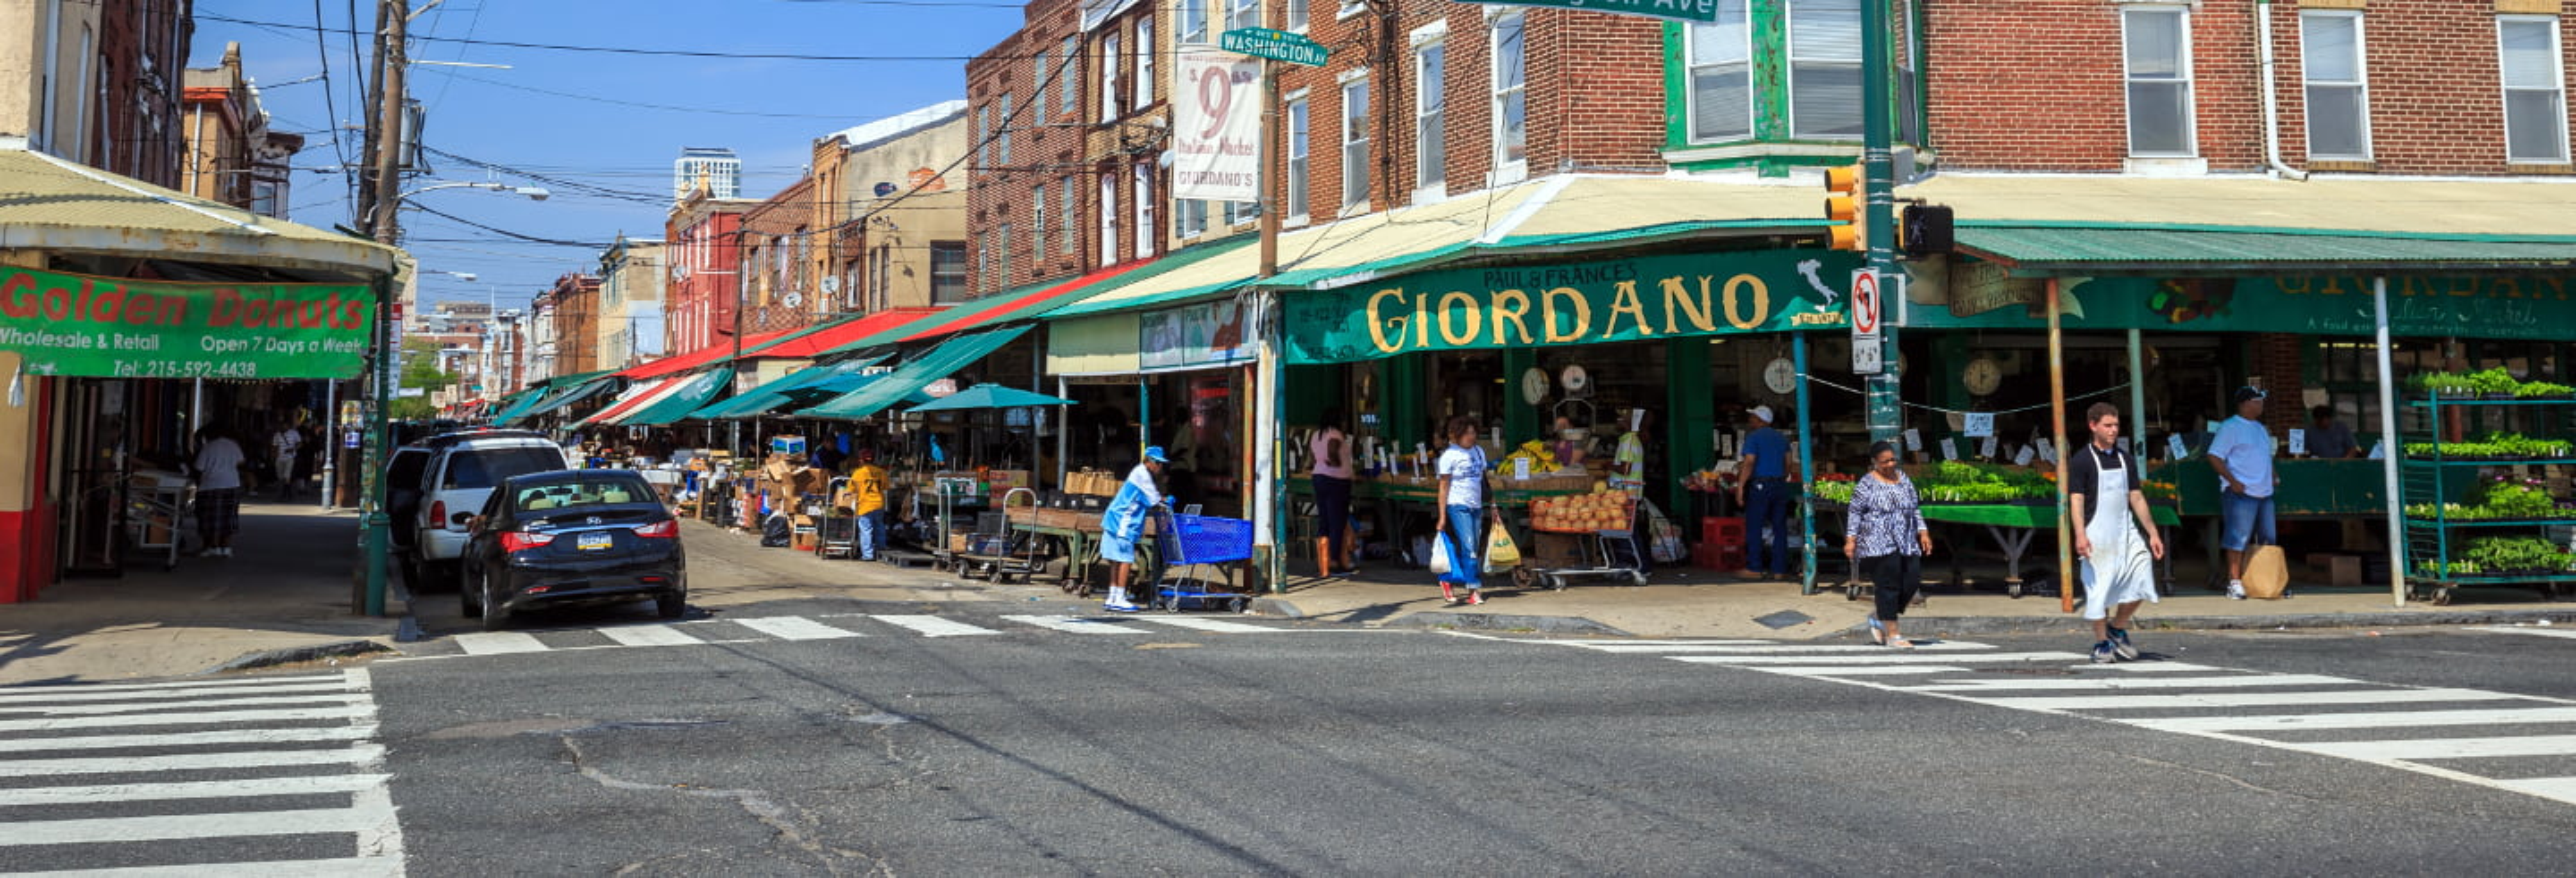 Philadelphia Murals & Markets Walking Tour